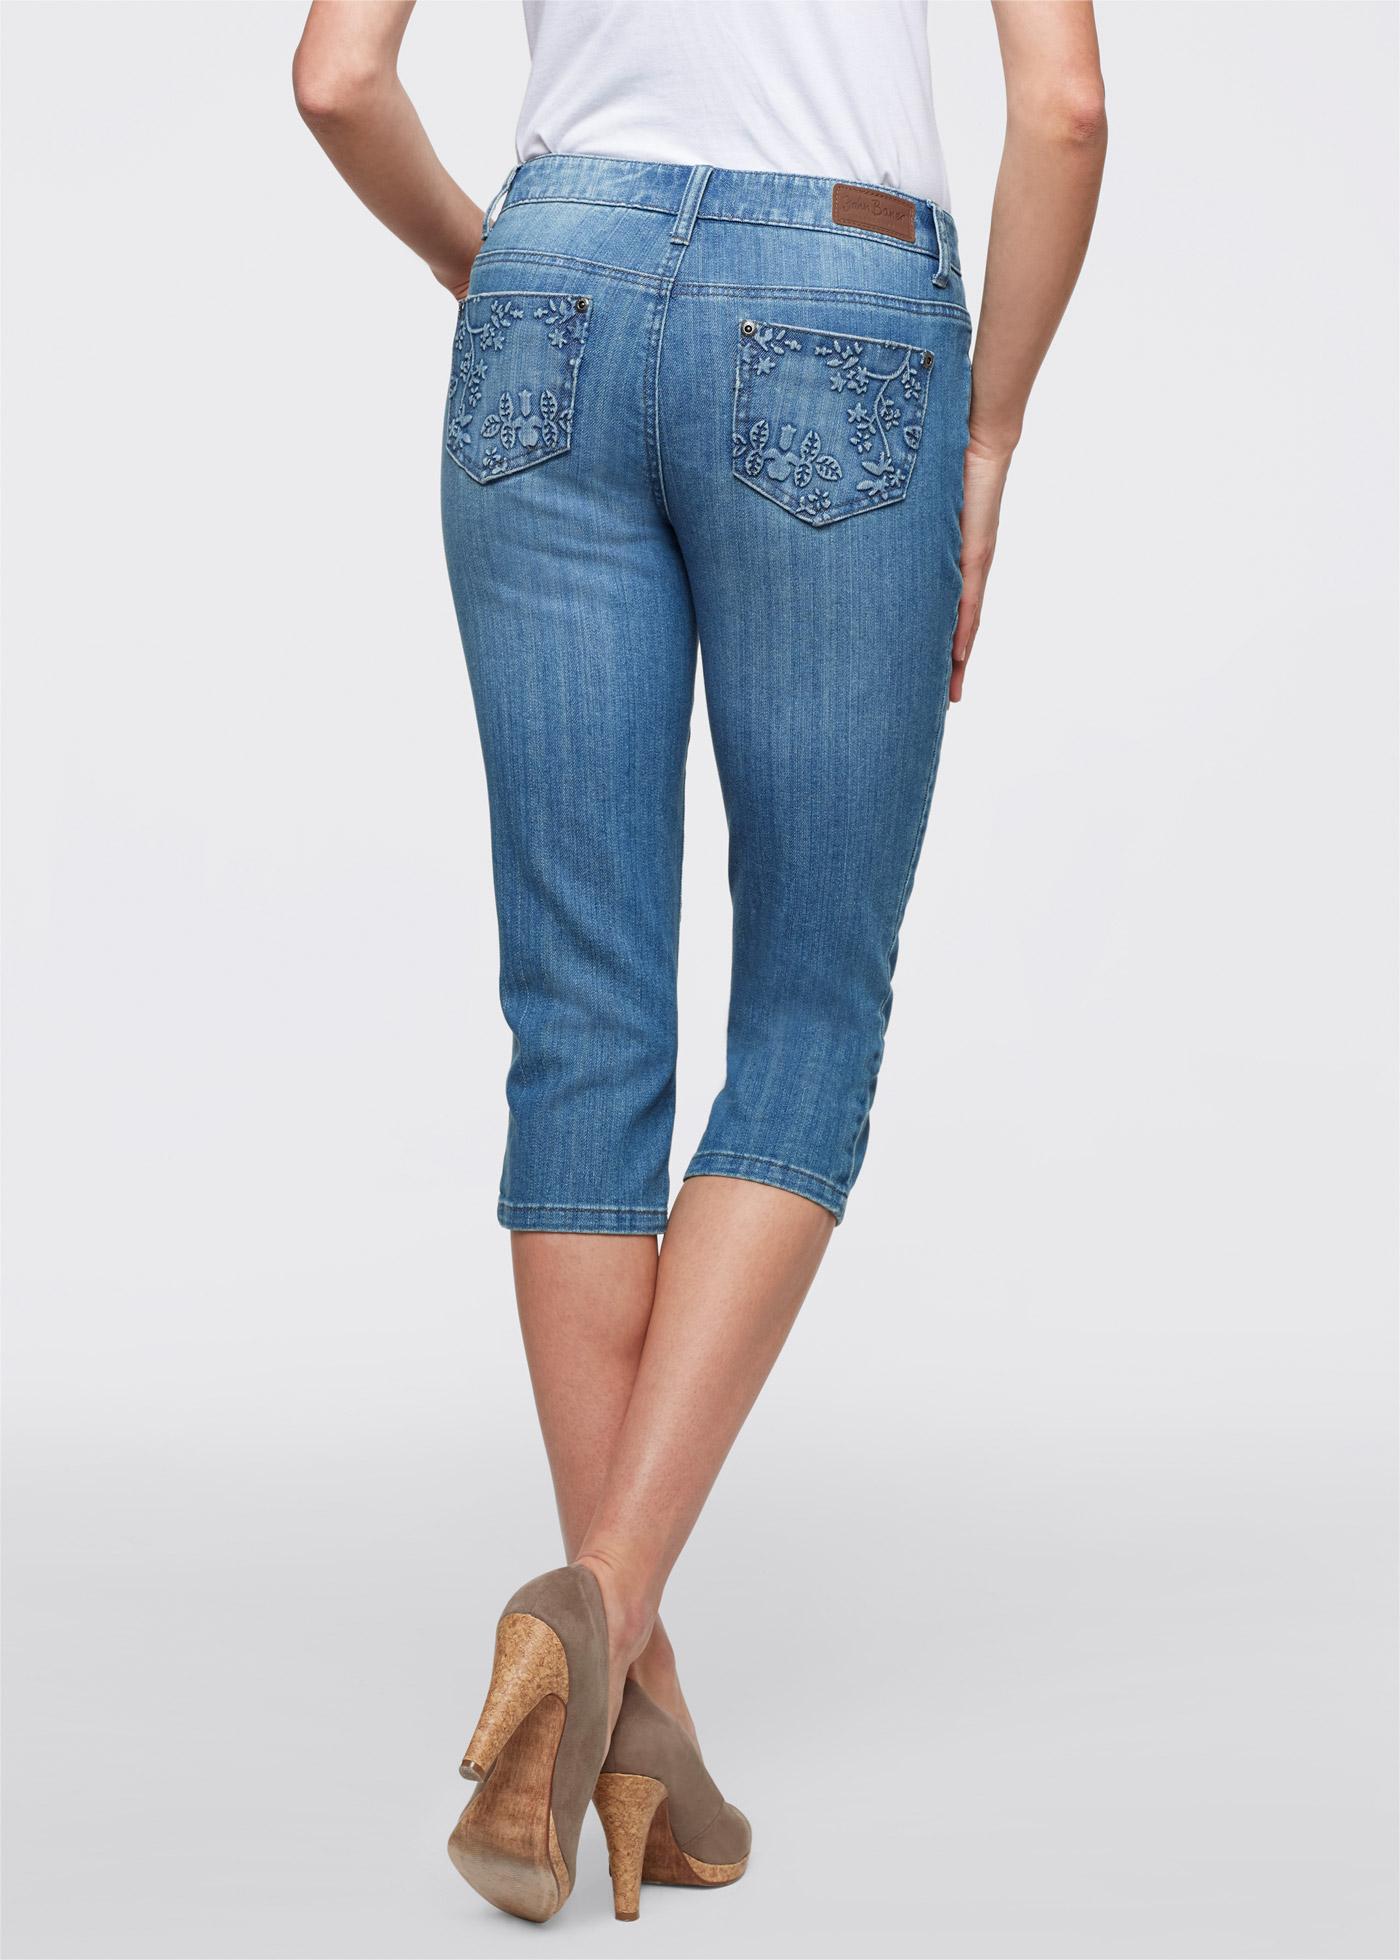 damen hose bequeme 3 4 hose stretch capri jeans gr 48 neu ebay. Black Bedroom Furniture Sets. Home Design Ideas